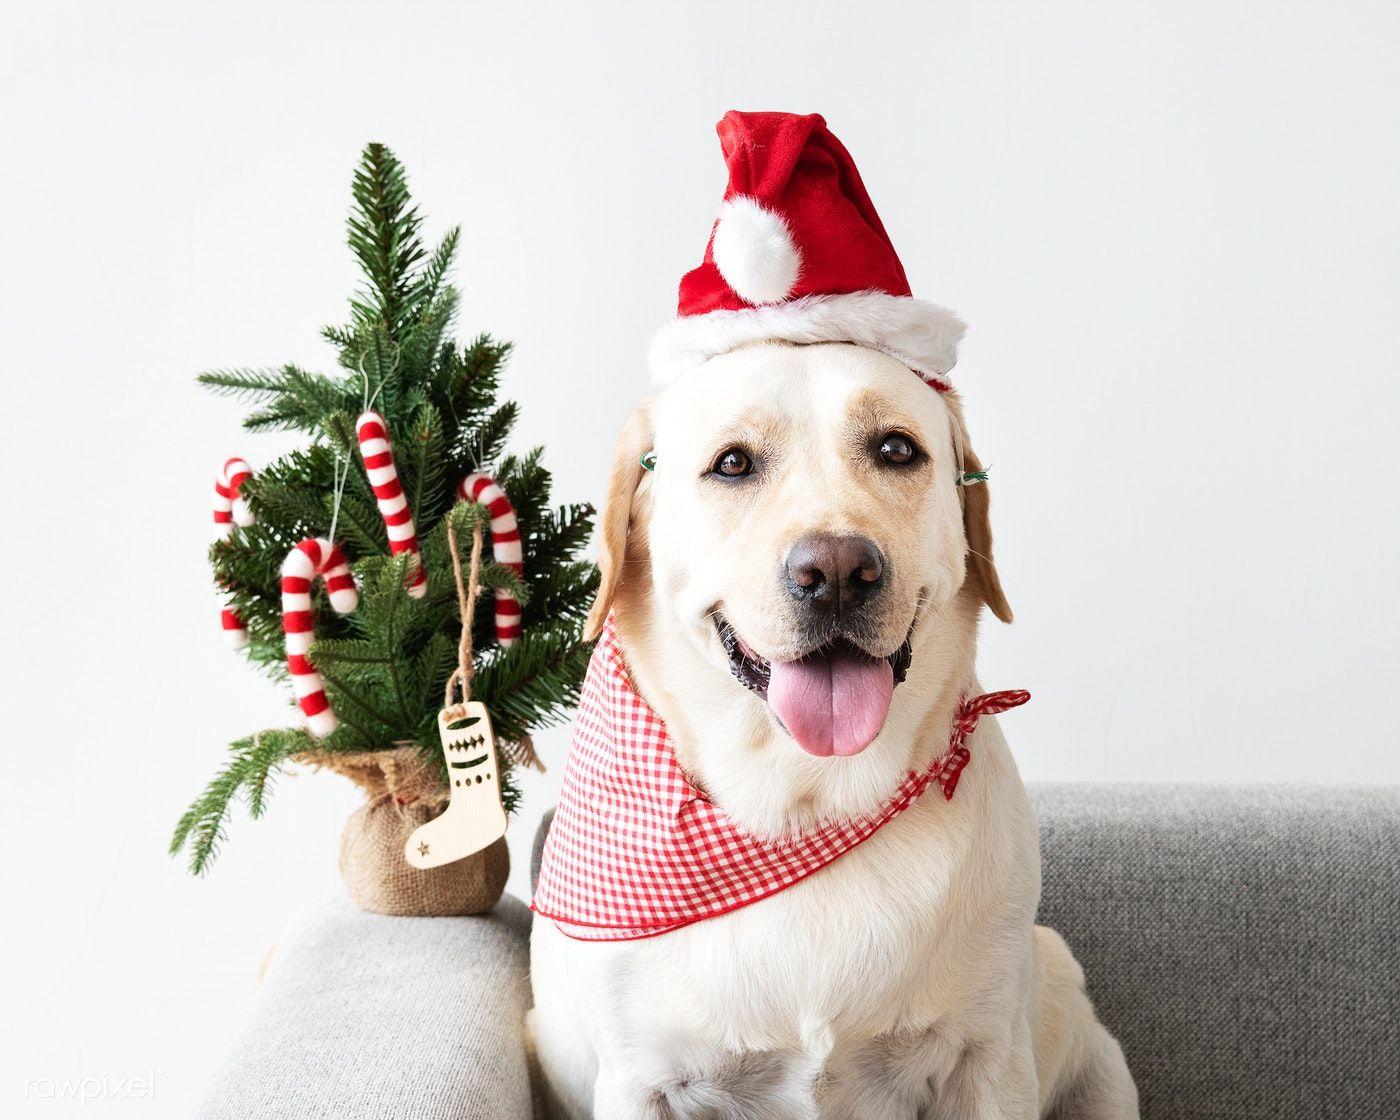 Cute Labrador Retriever Wearing A Christmas Hat Free Image By Rawpixel Com Jira Labrador Christmas Hat Labrador Retriever